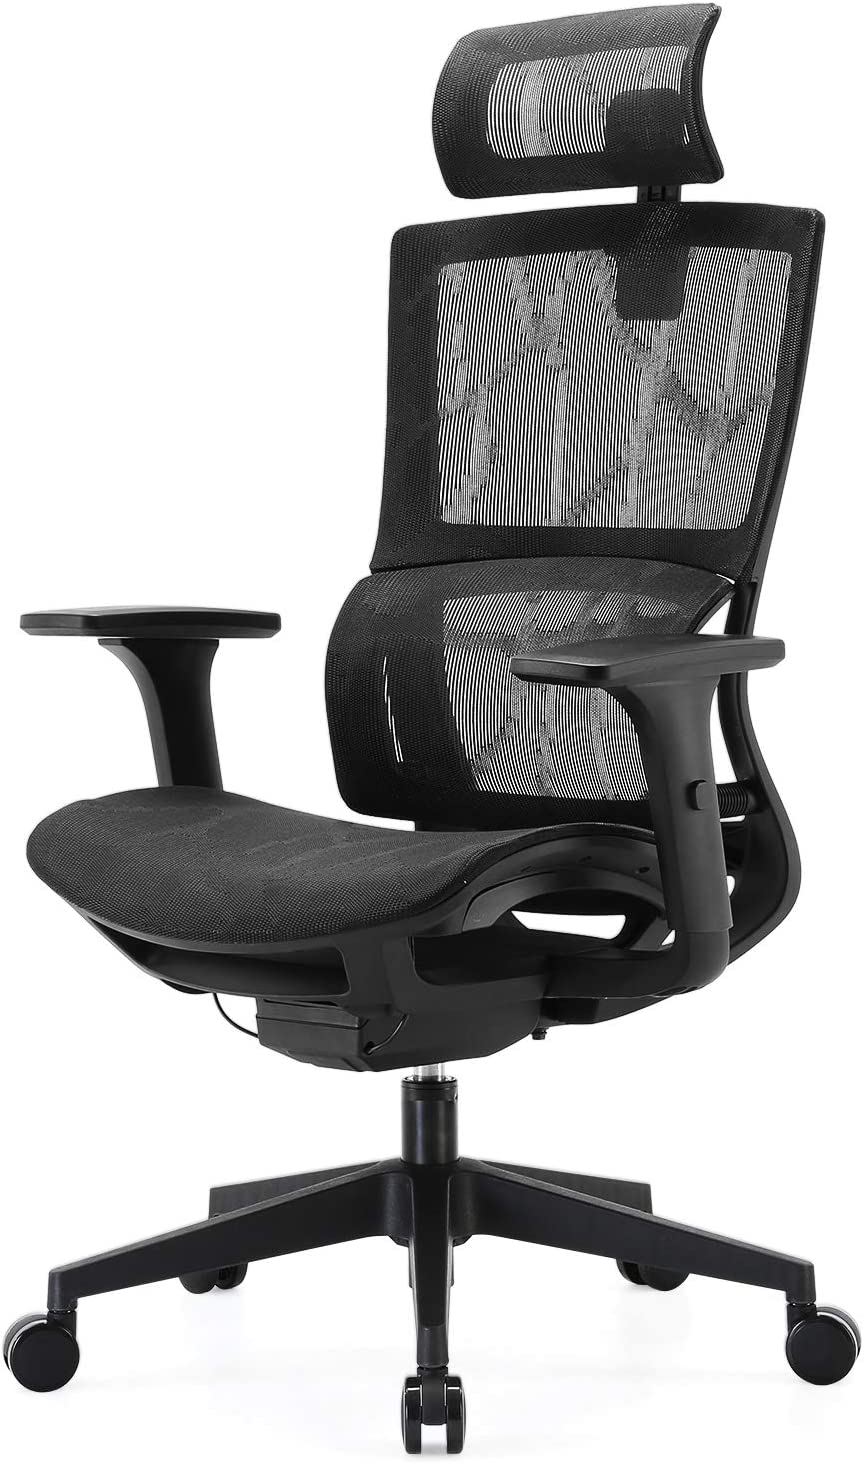 SIHOO Ergonomic Office Chair UK - Adjustable 3D Armrest